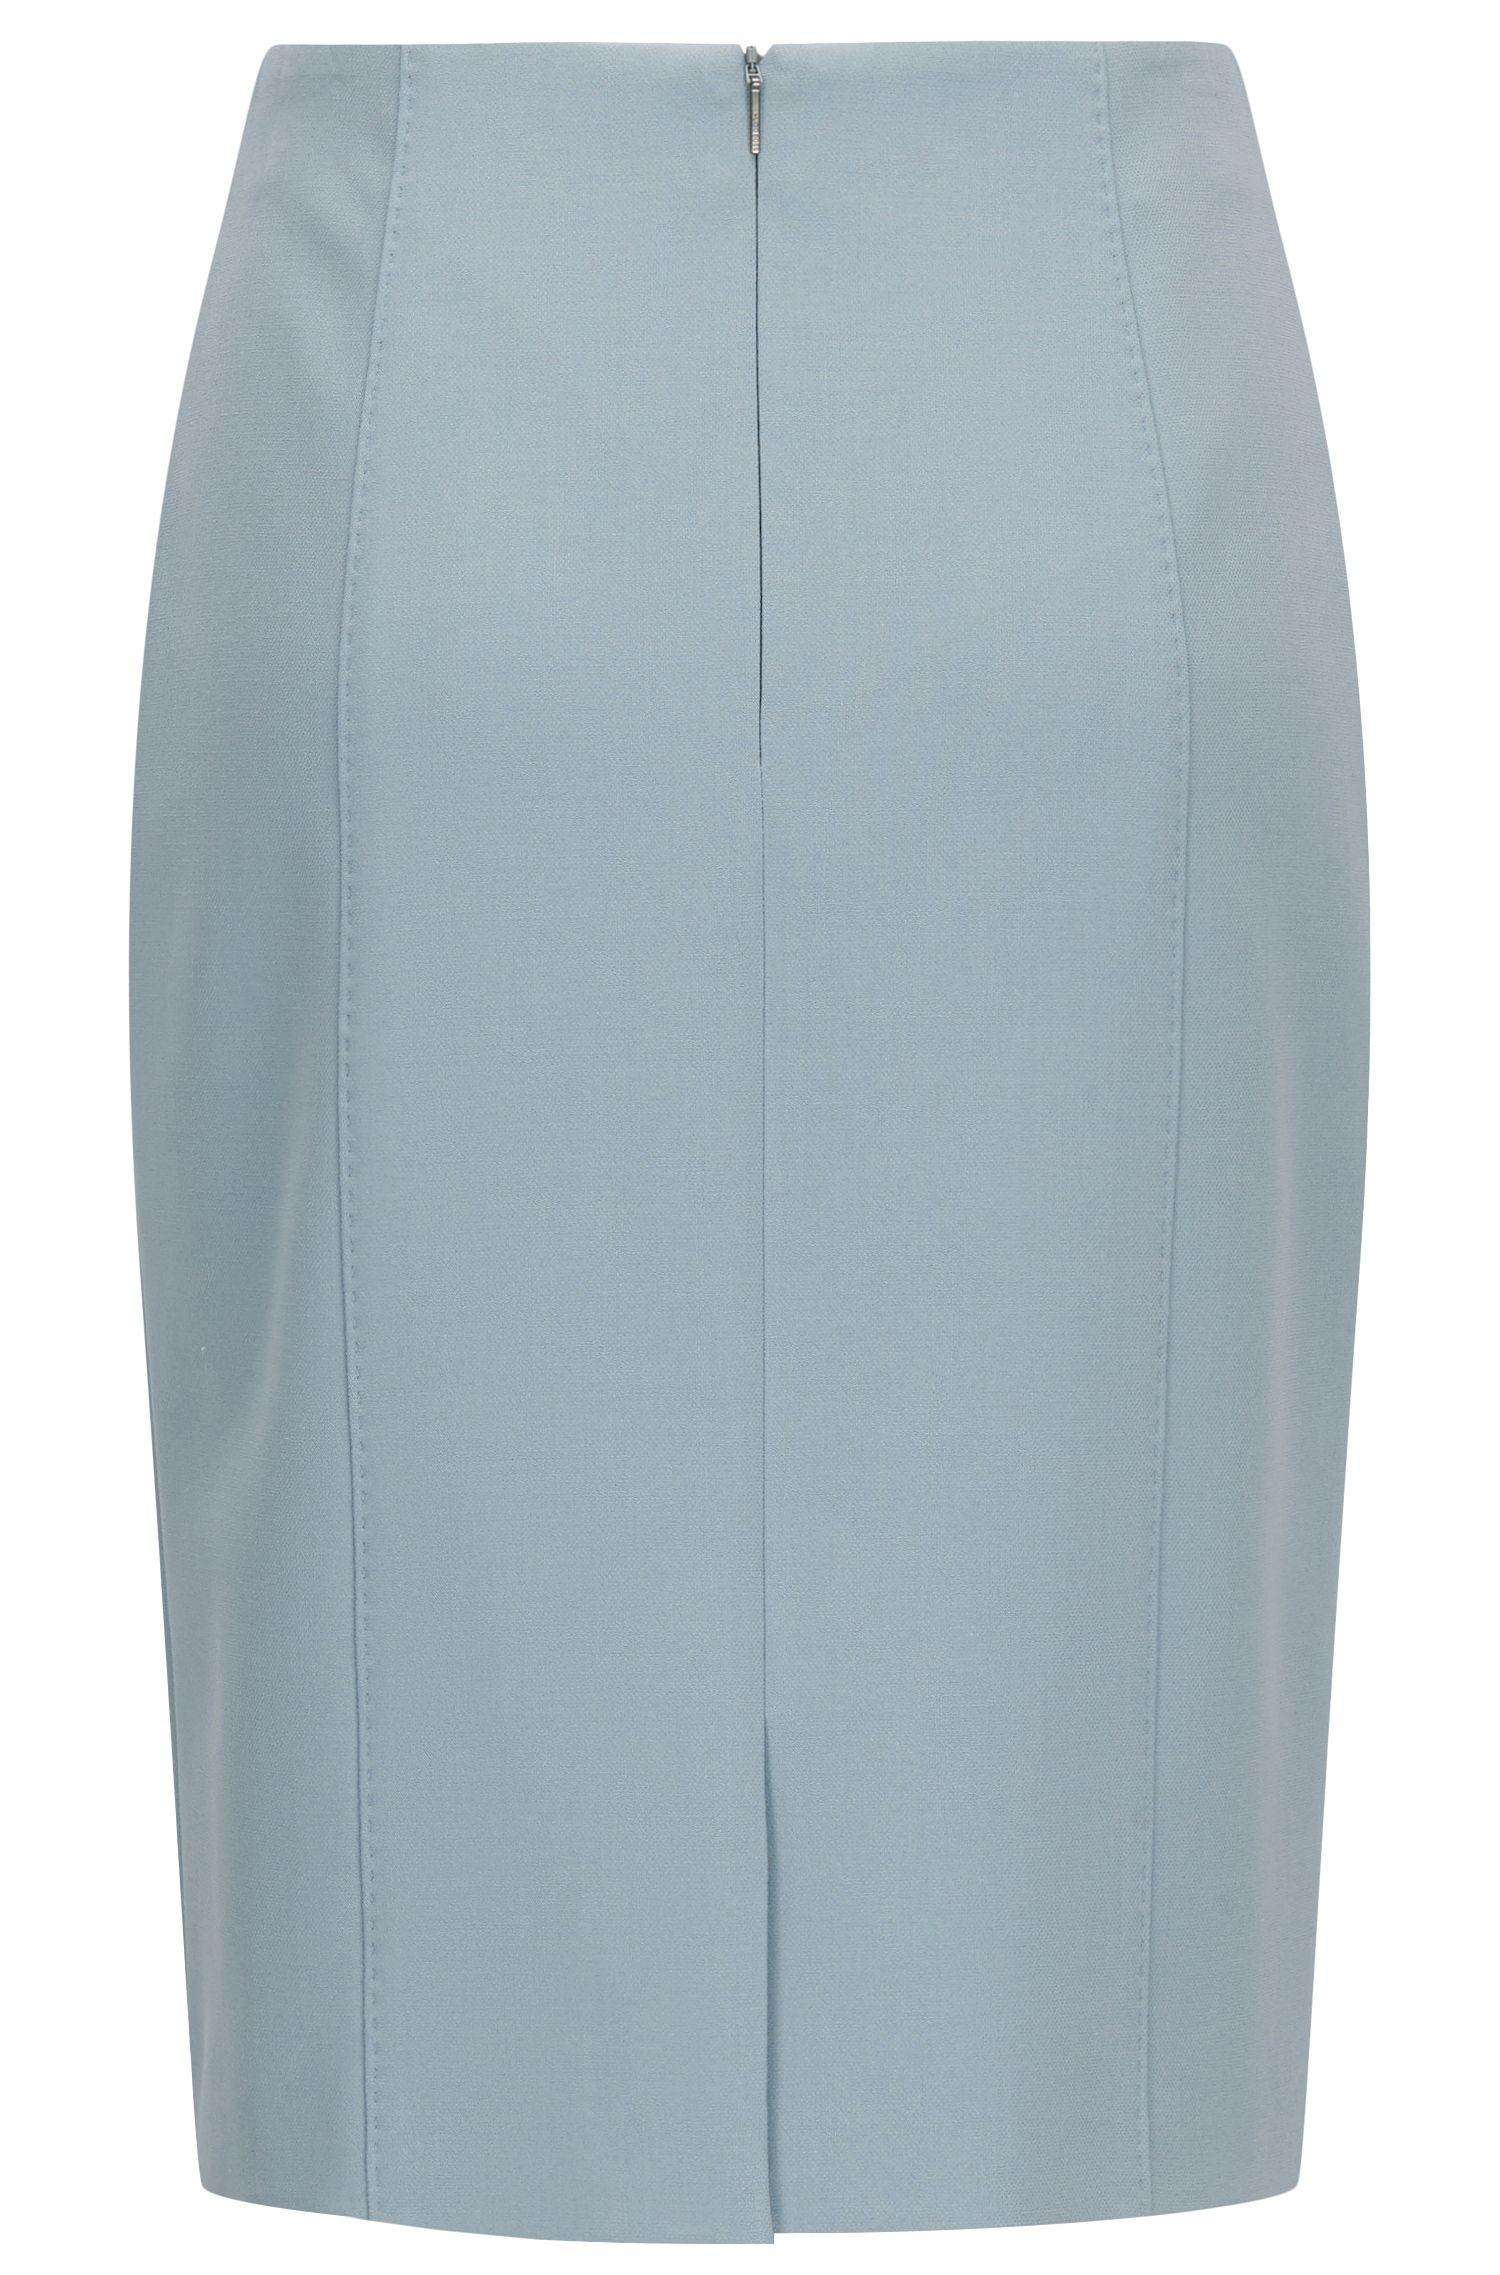 Viscose Blend Pencil Skirt | Velafea